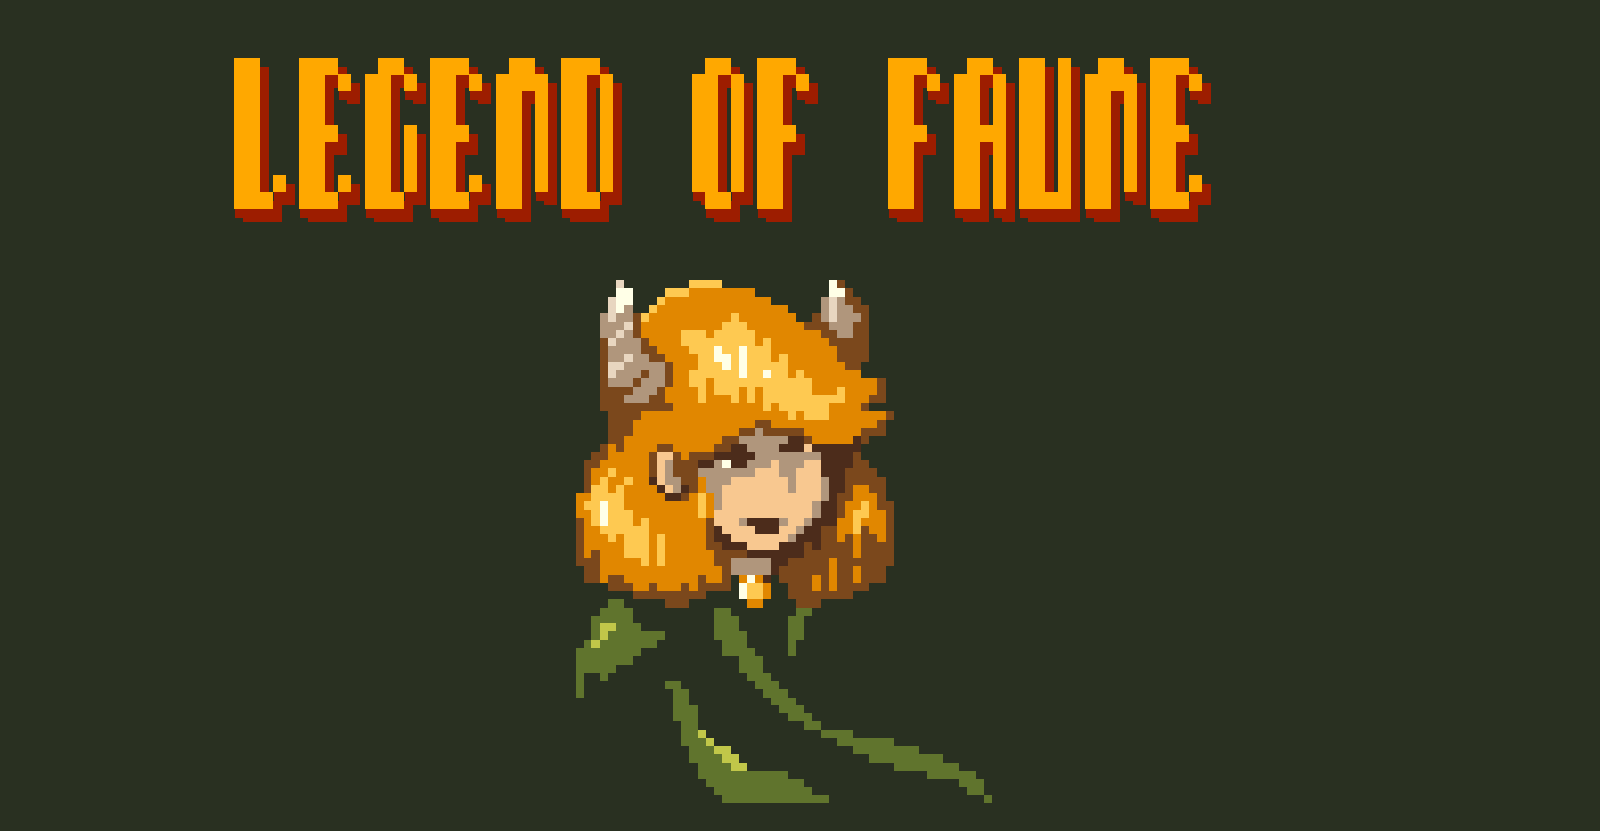 Legend of Faune